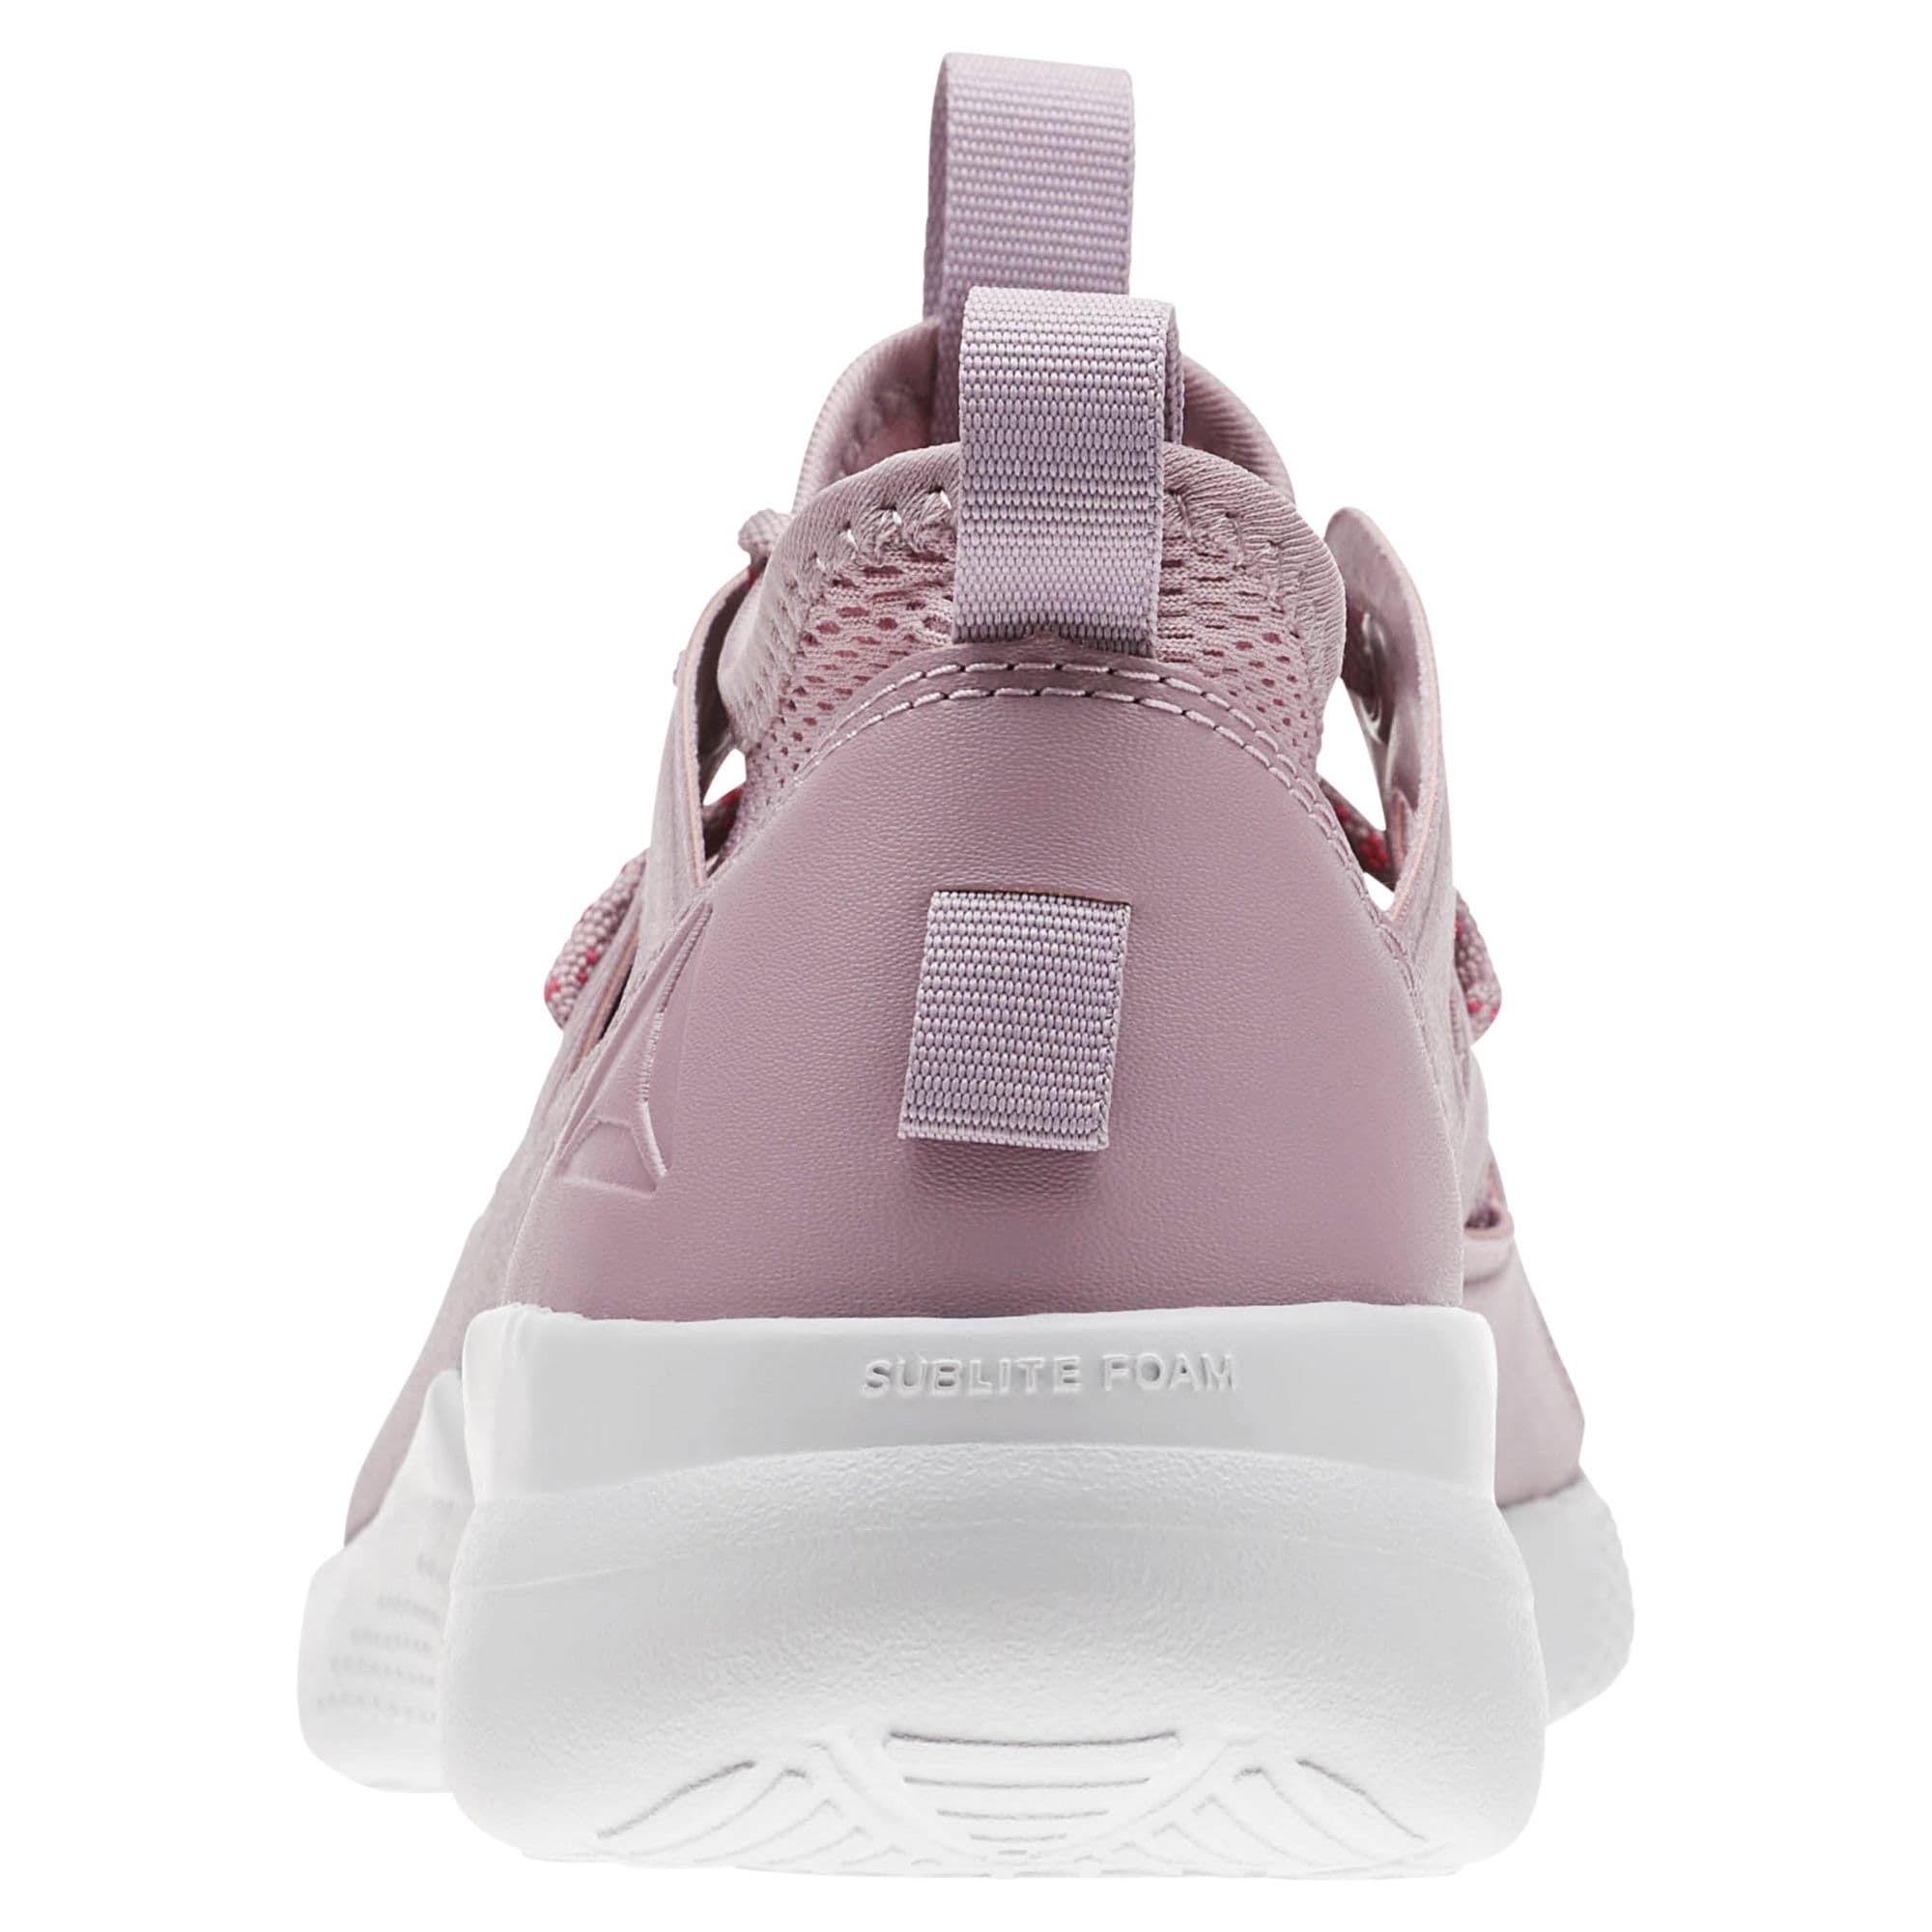 Motion Damen Pink Cardio Reebok Für Lila Fitnessschuhe wA8xqT